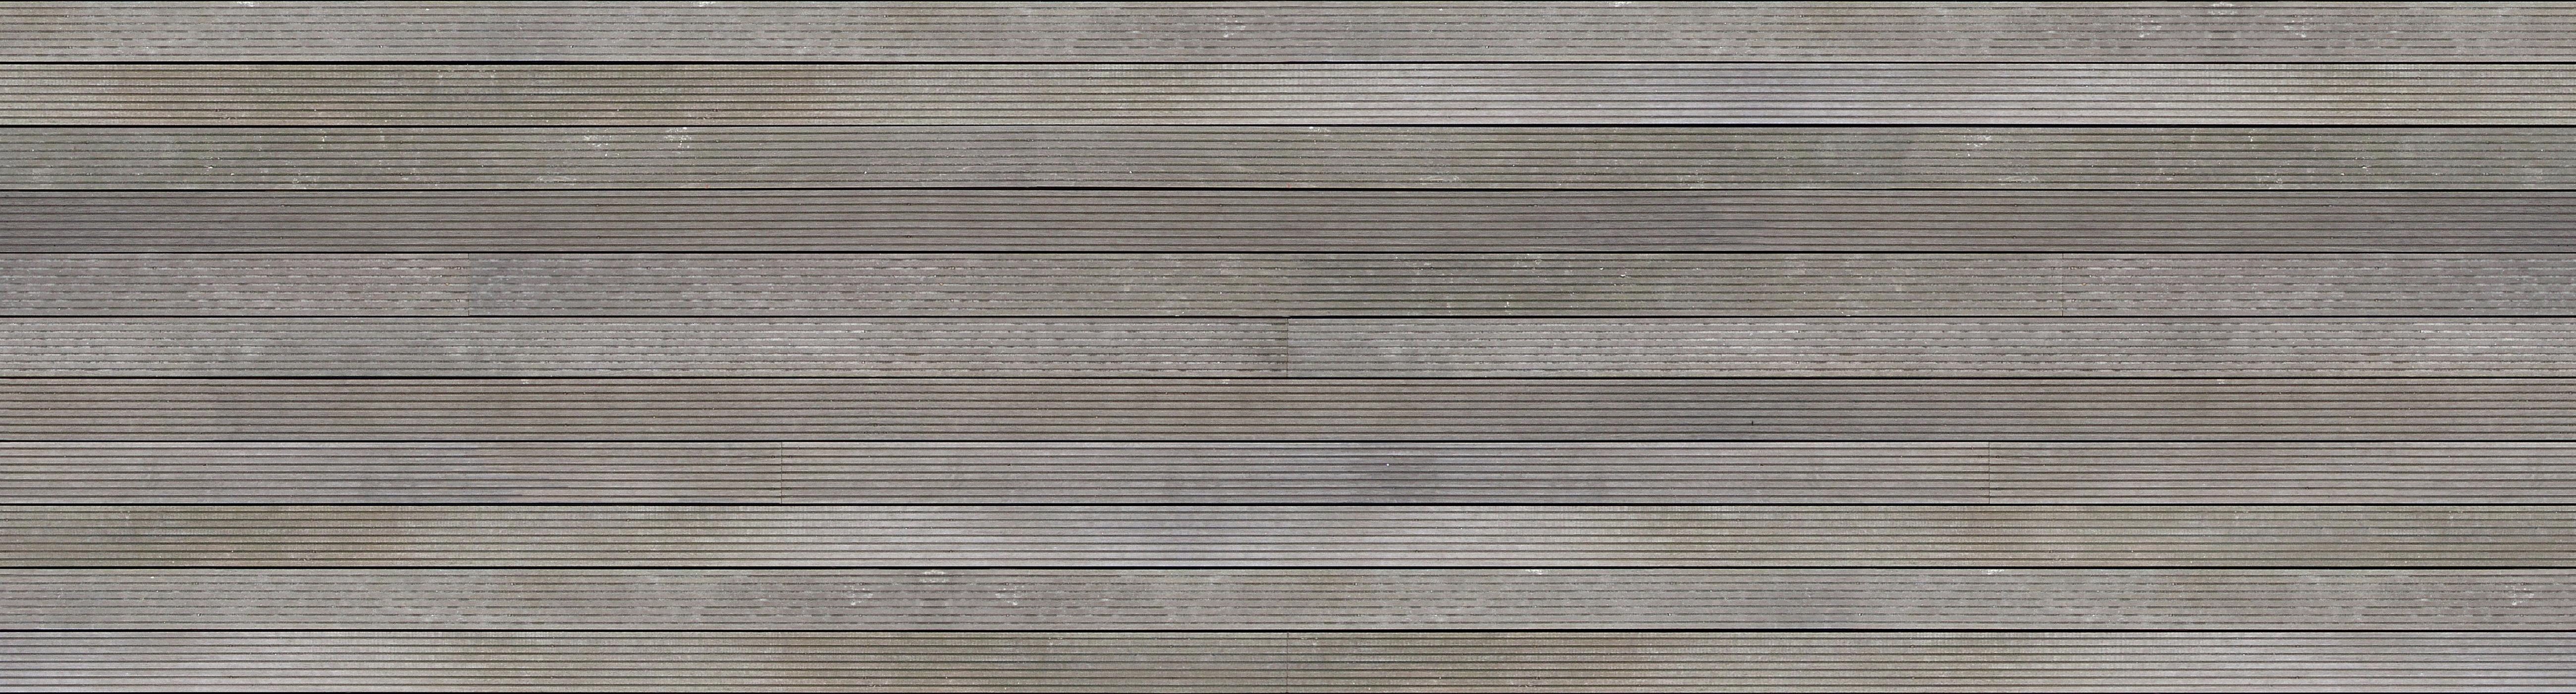 Texture Terrace Floor Boards Bankirai Wood Seier House Floor